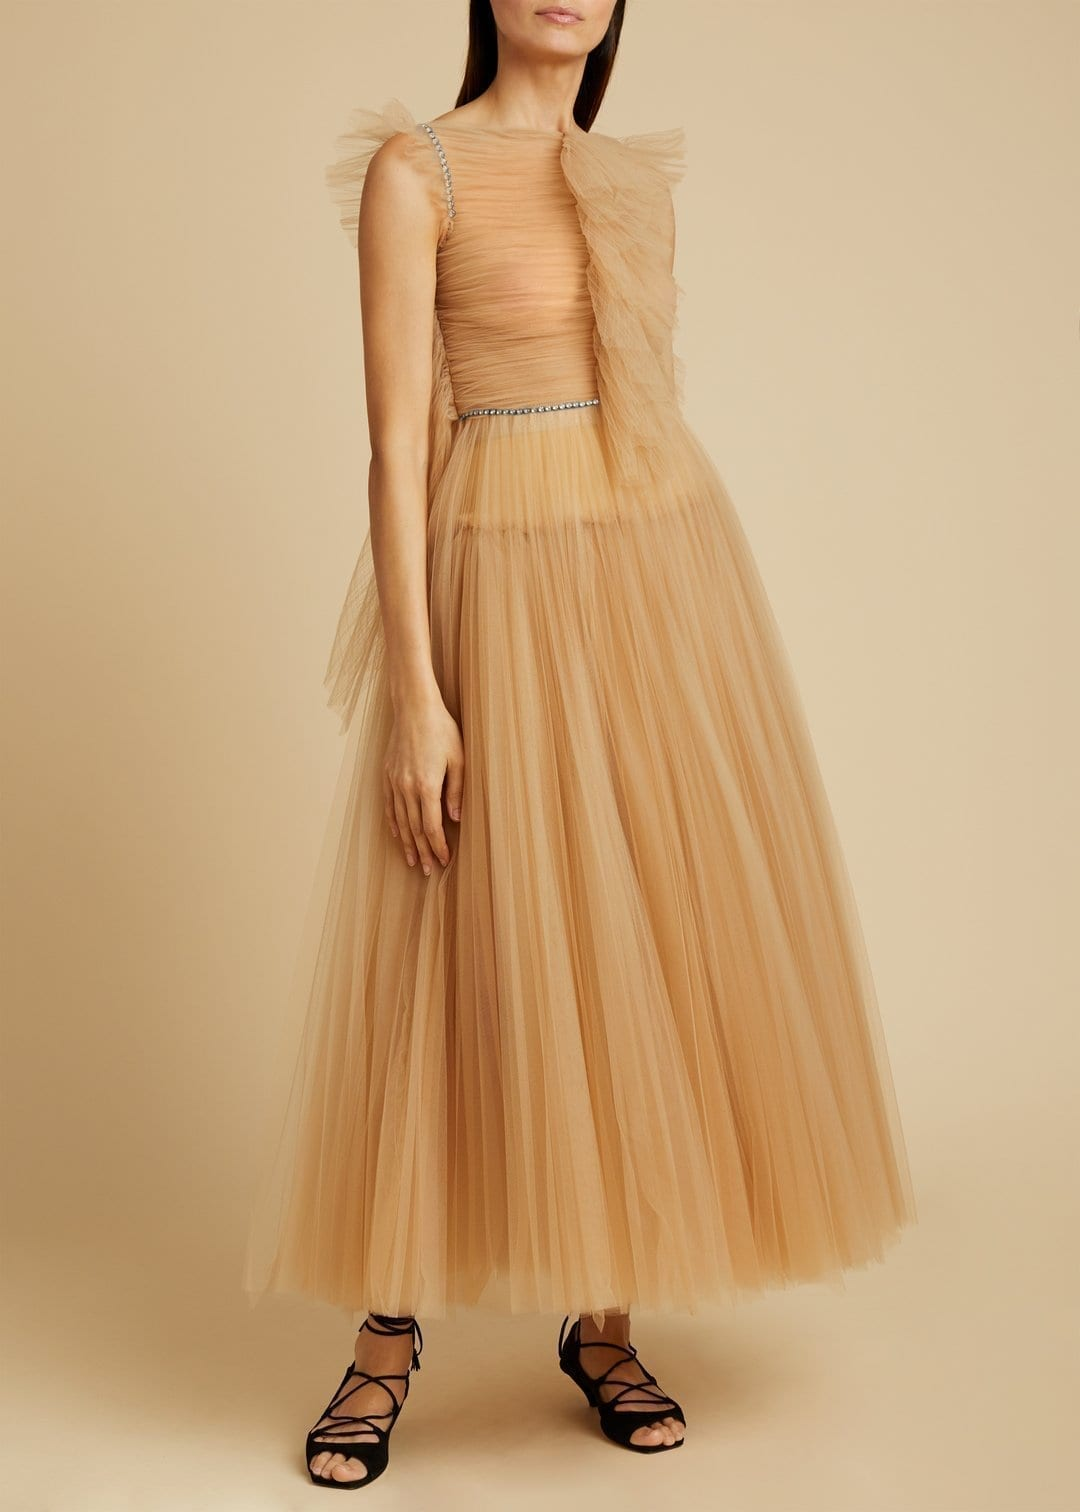 KHAITE The Paige Dress